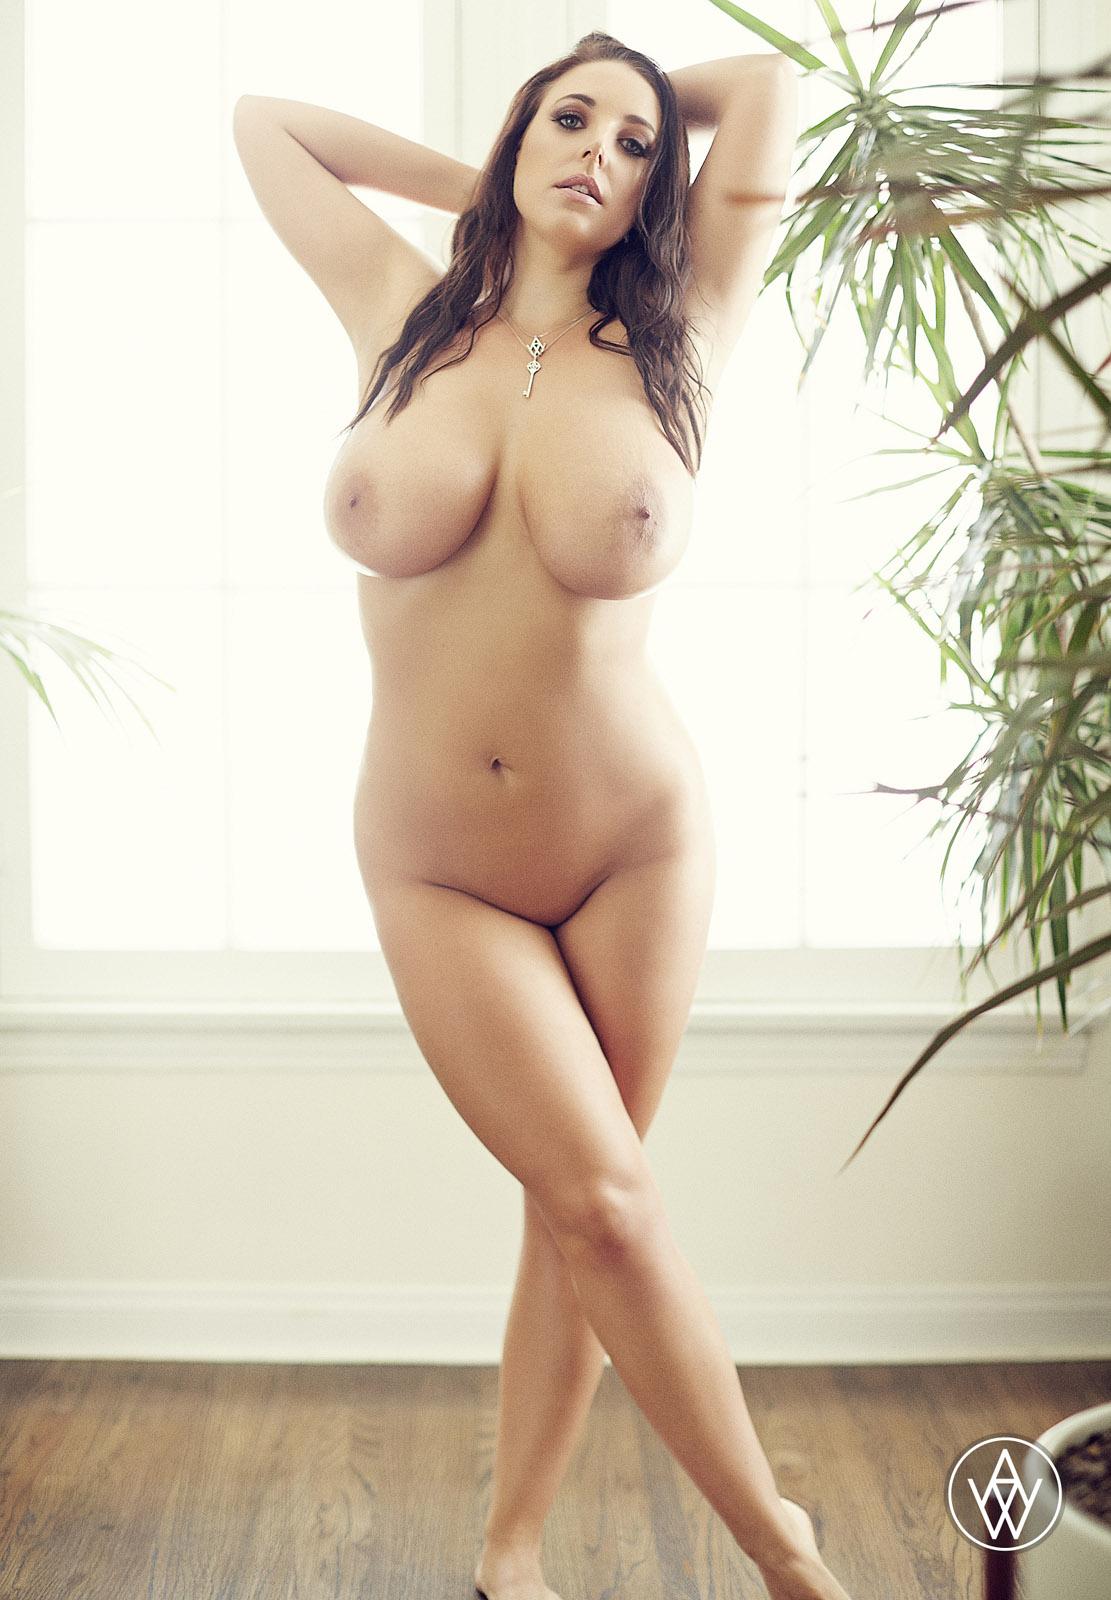 Nude babes gallery goa